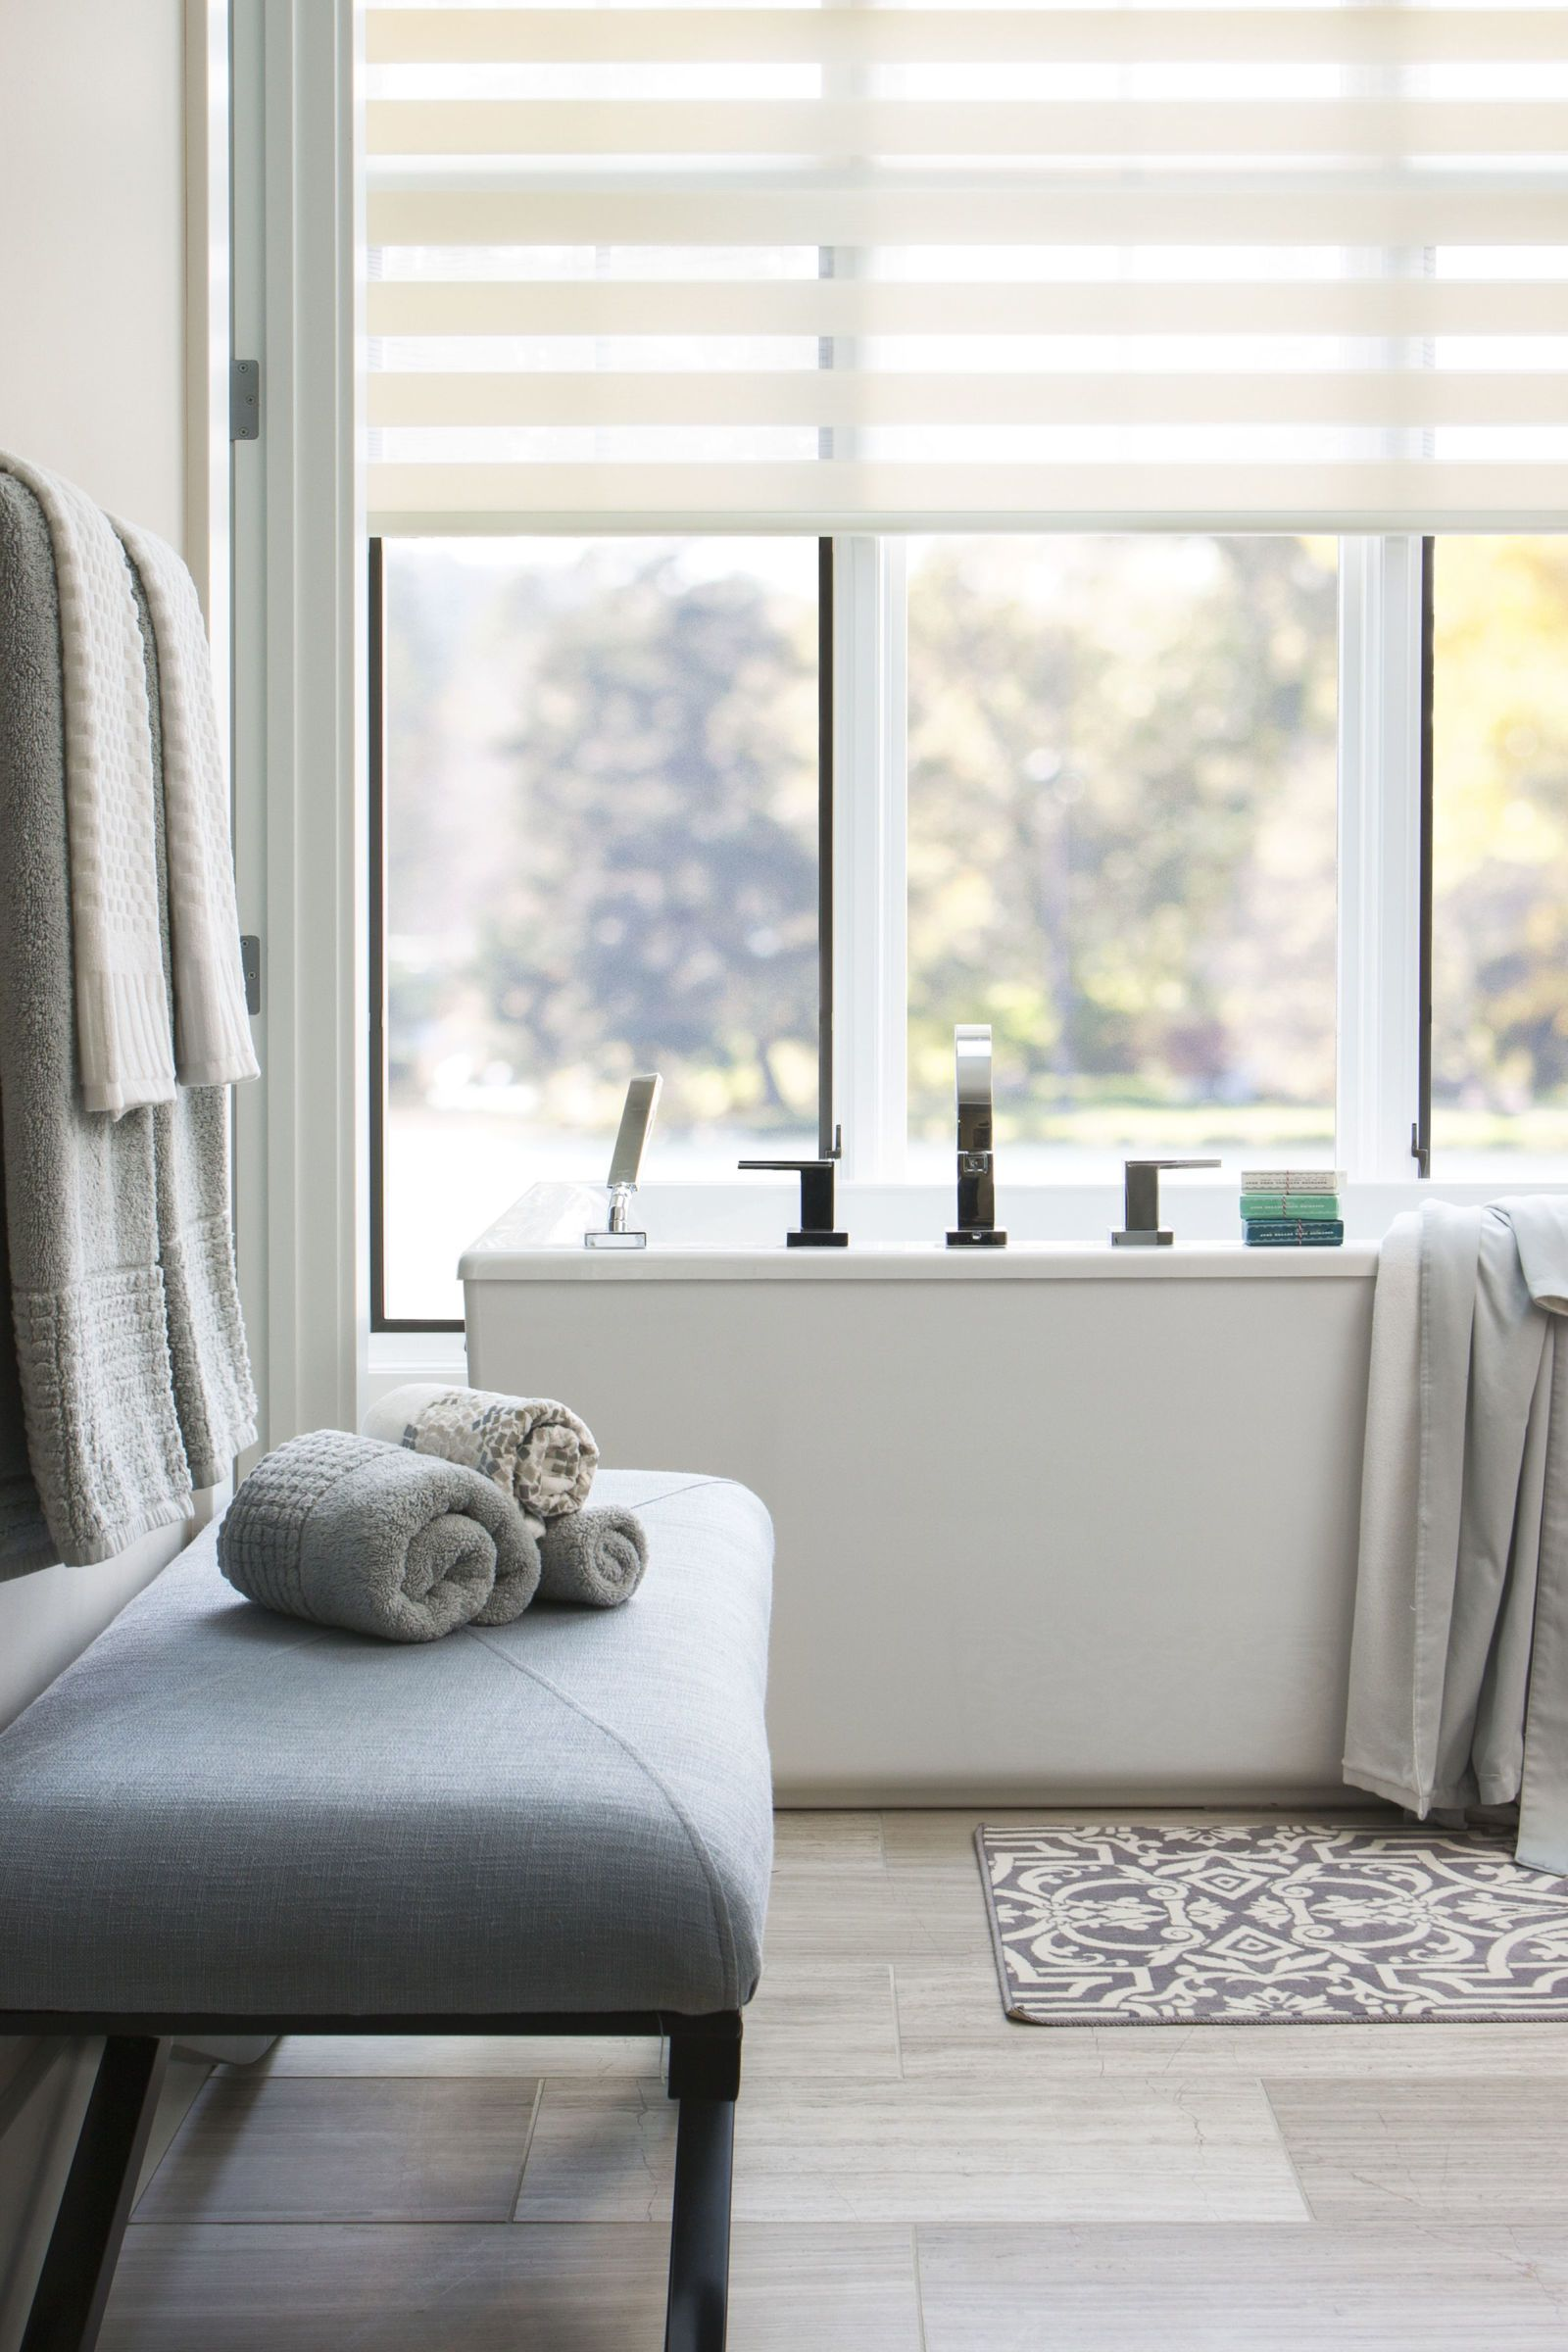 20 Ideen Fur Schone Bader Badezimmer Ideen Bathroom Ideas